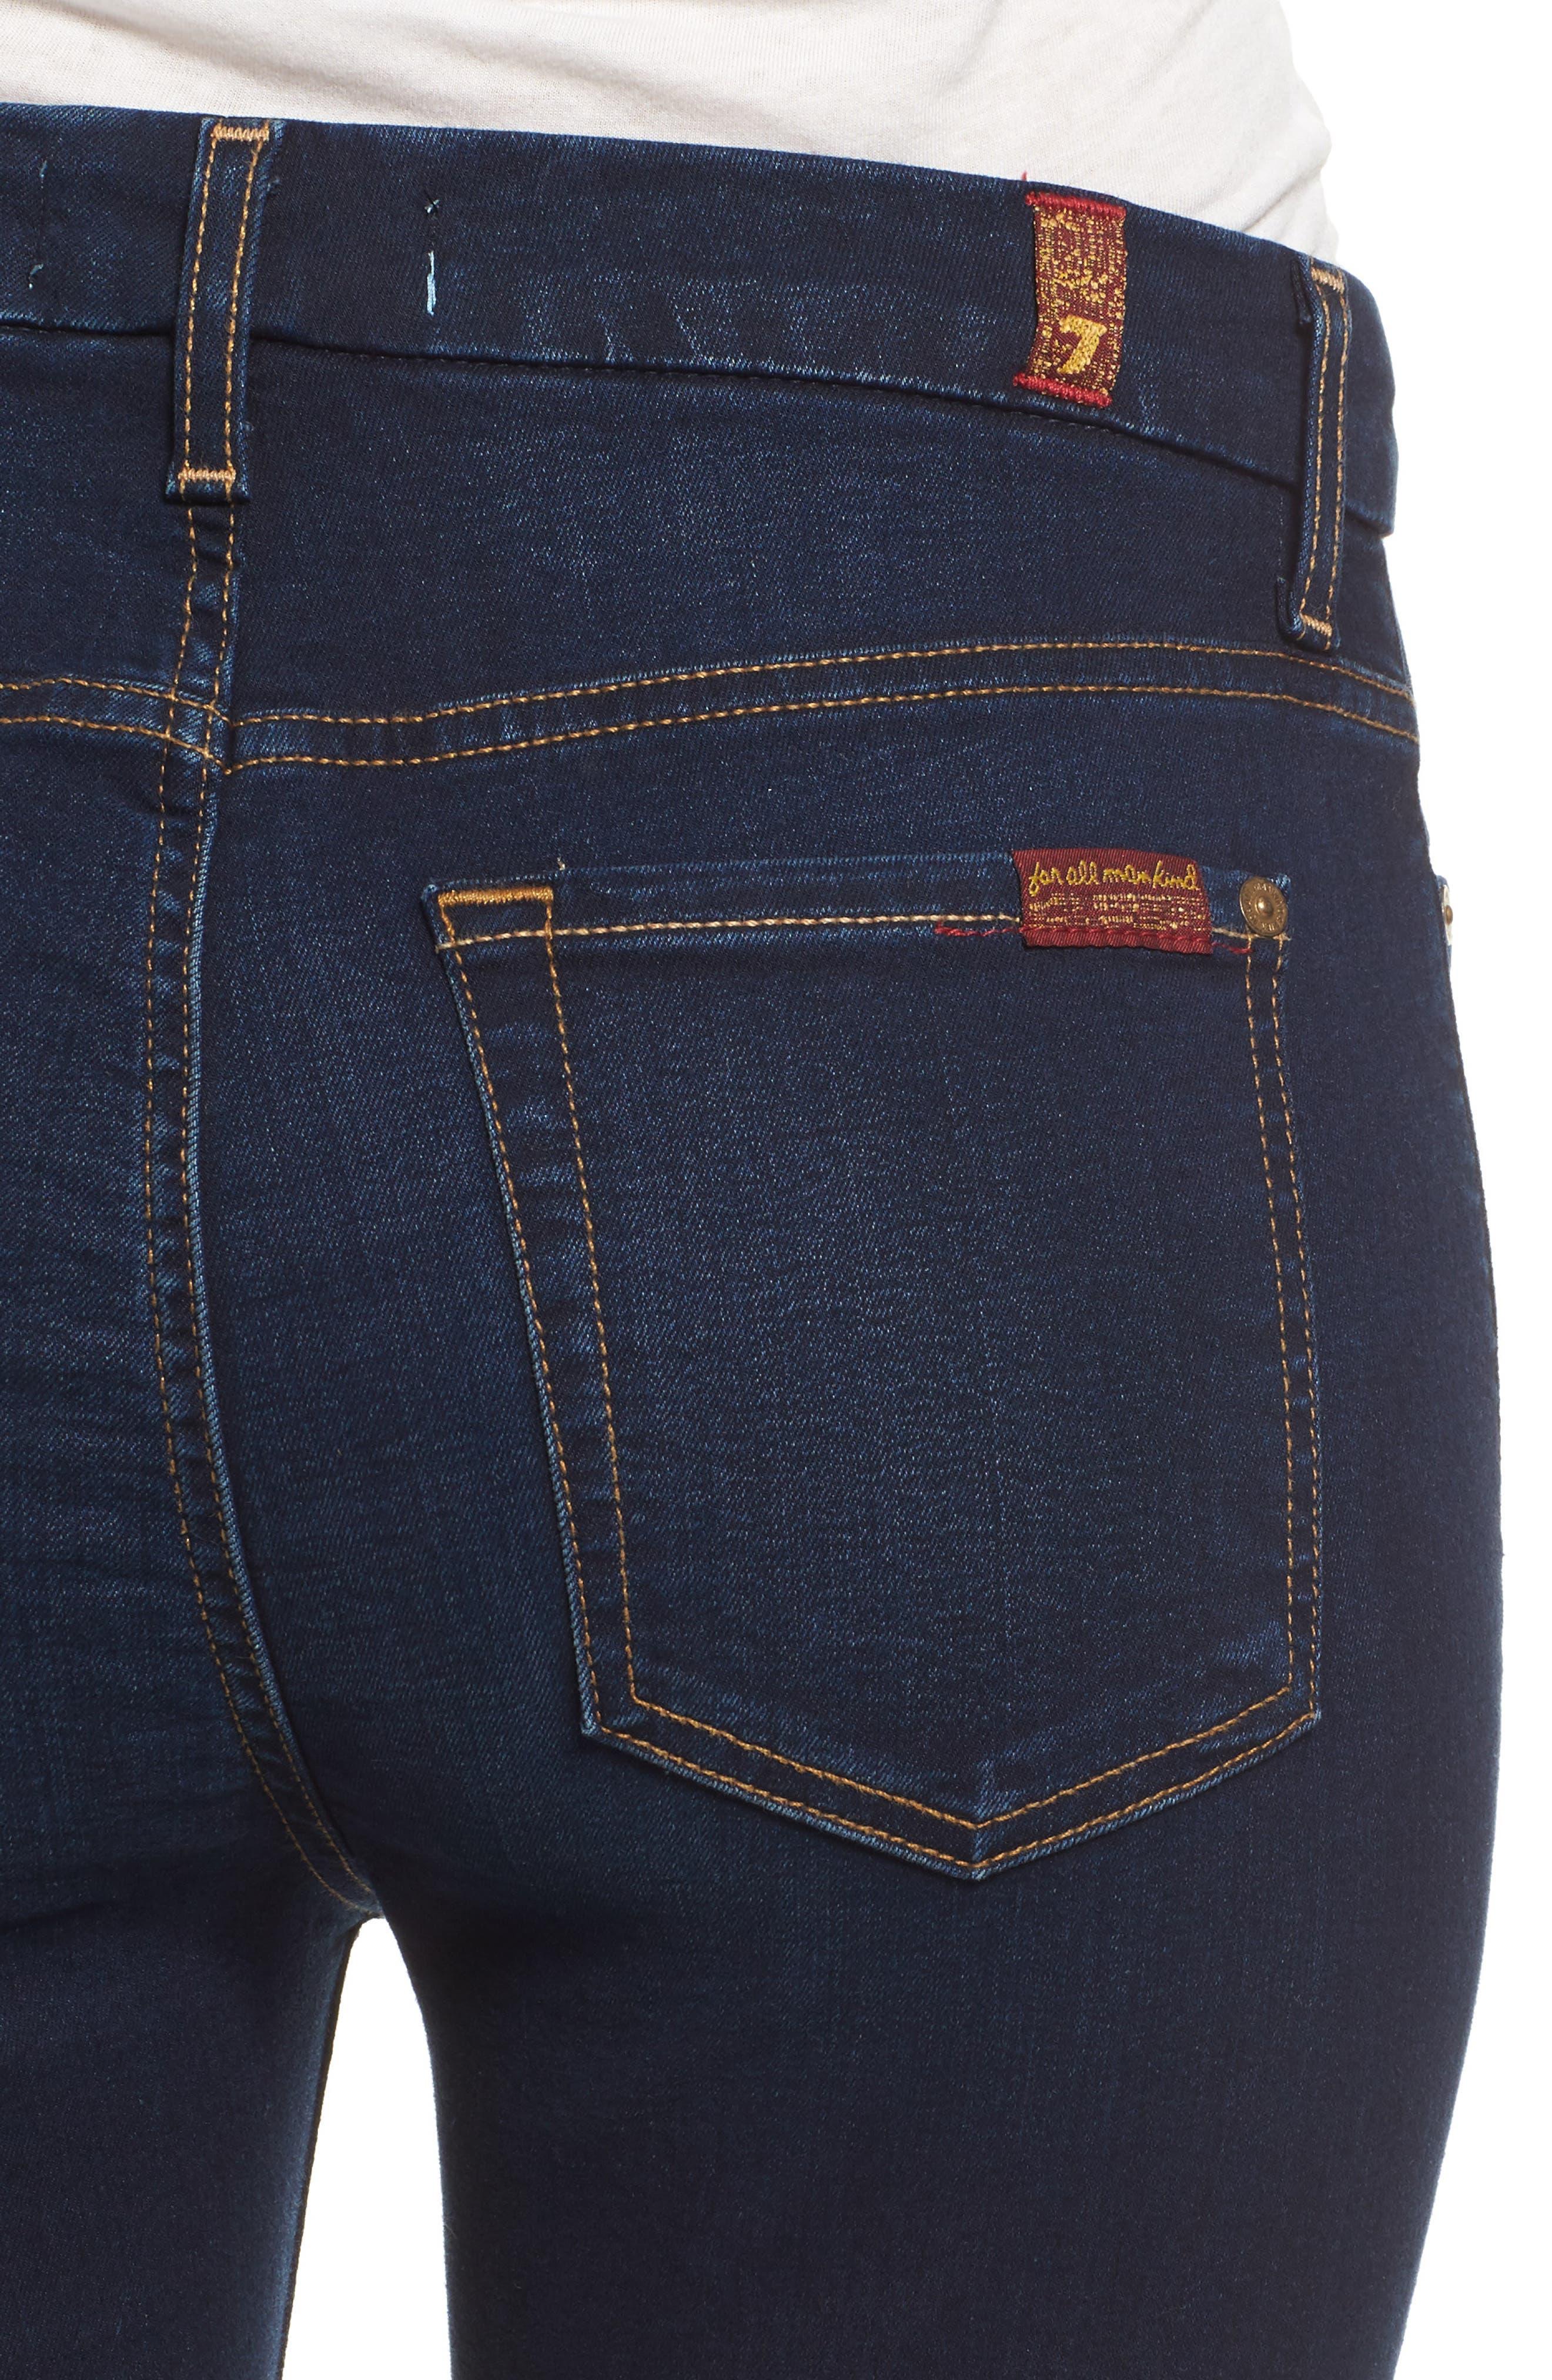 b(air) High Waist Skinny Jeans,                             Alternate thumbnail 4, color,                             400